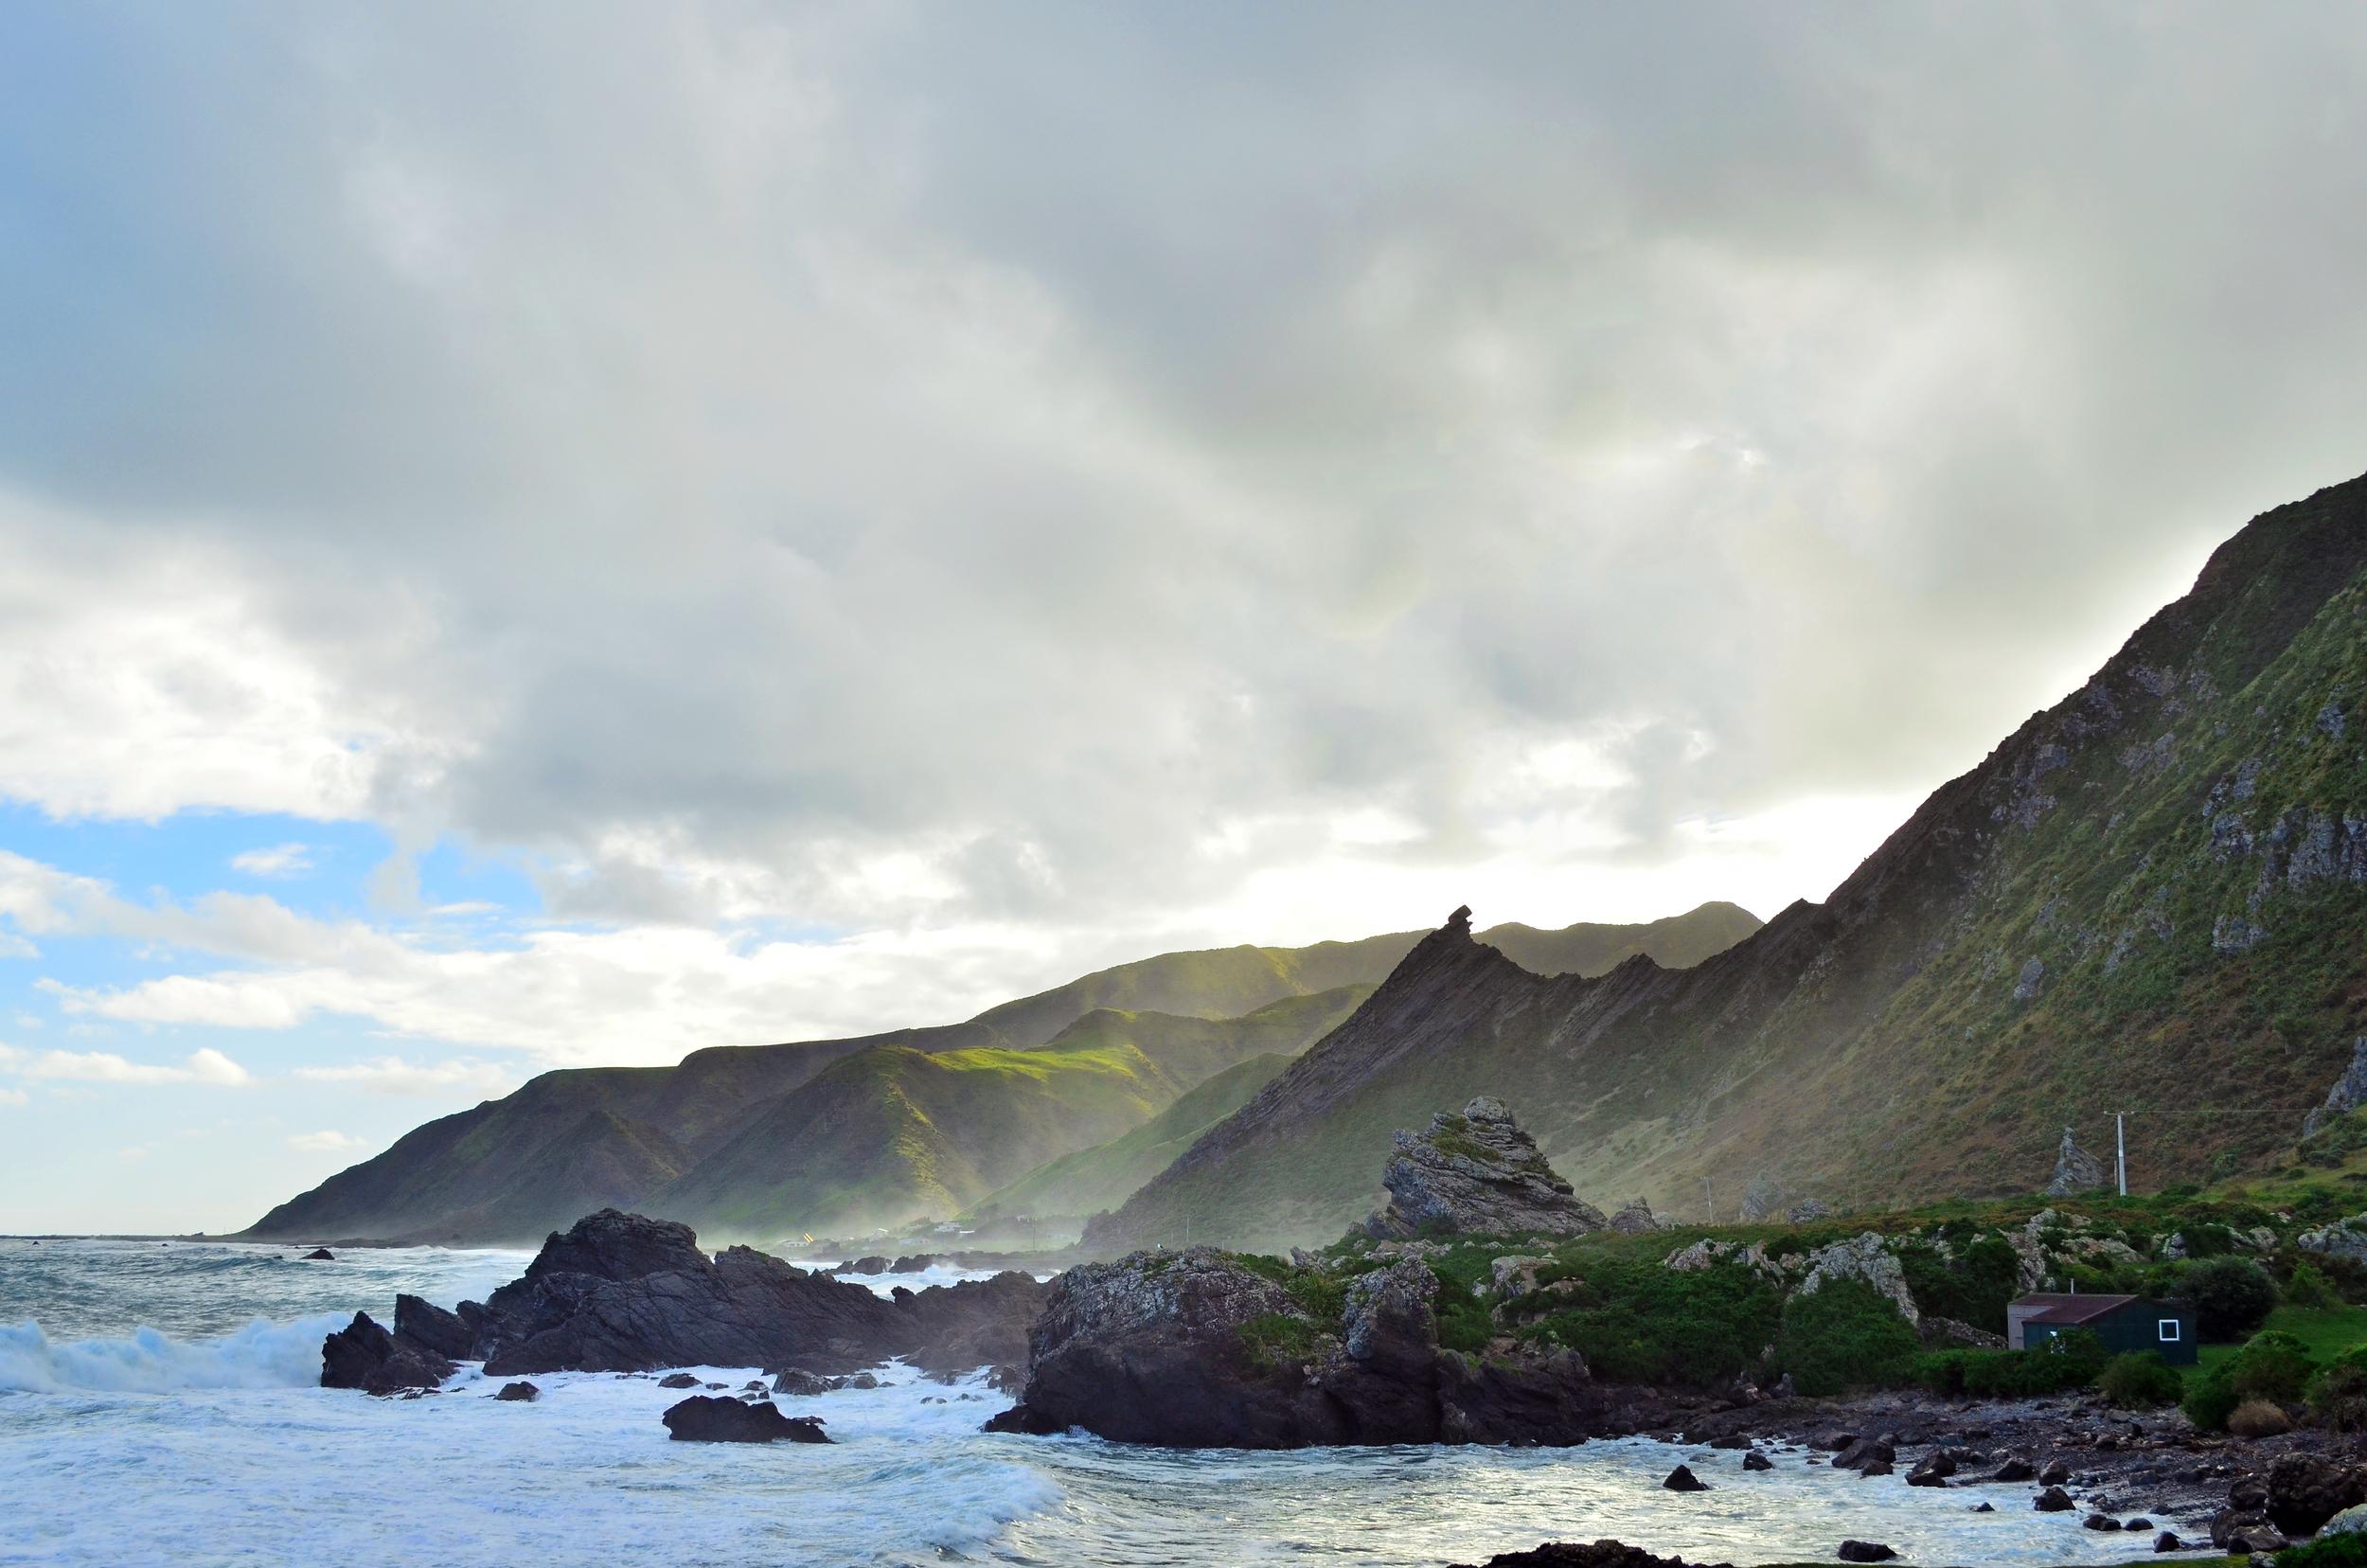 [5] Cape Palliser Coast, North Island.